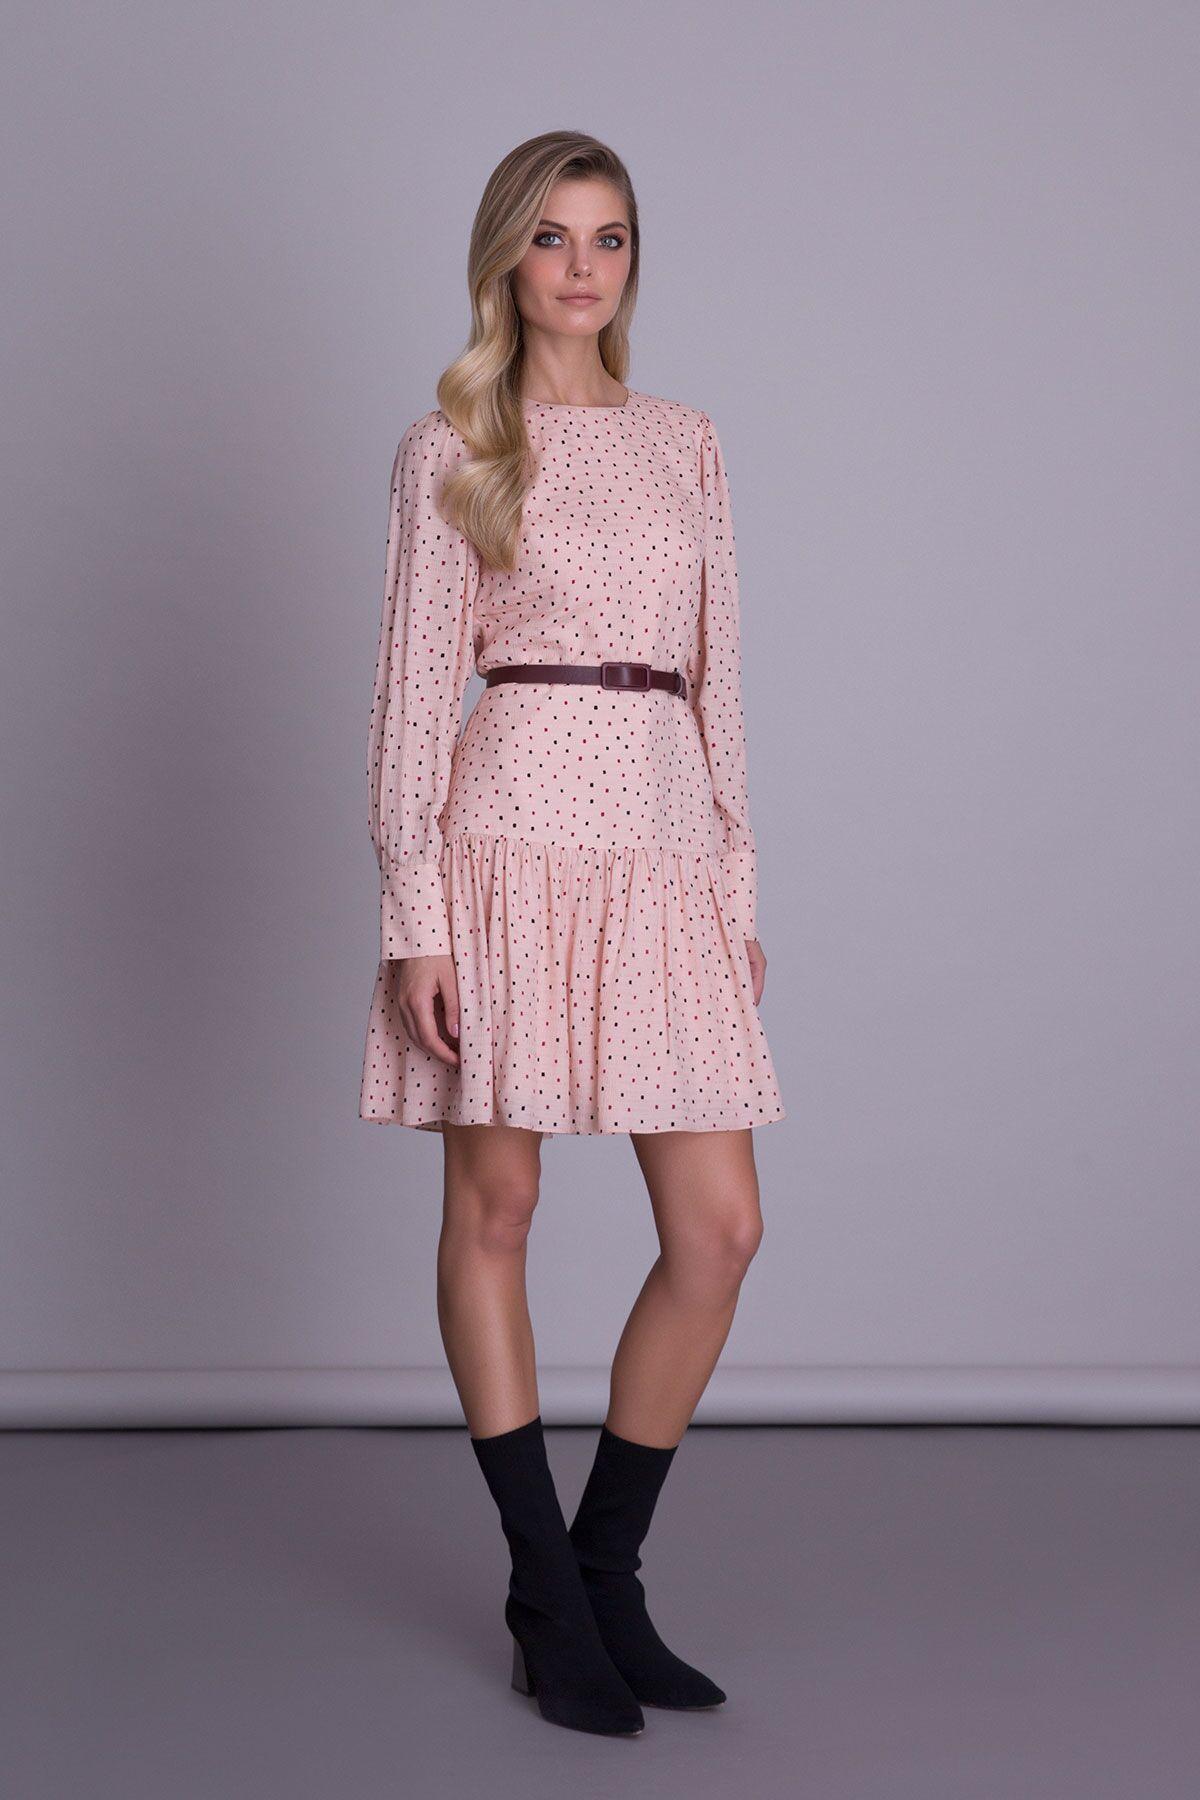 GIZIA CASUAL - Puantiye Desenli Kemerli Pudra Renk Mini Elbise